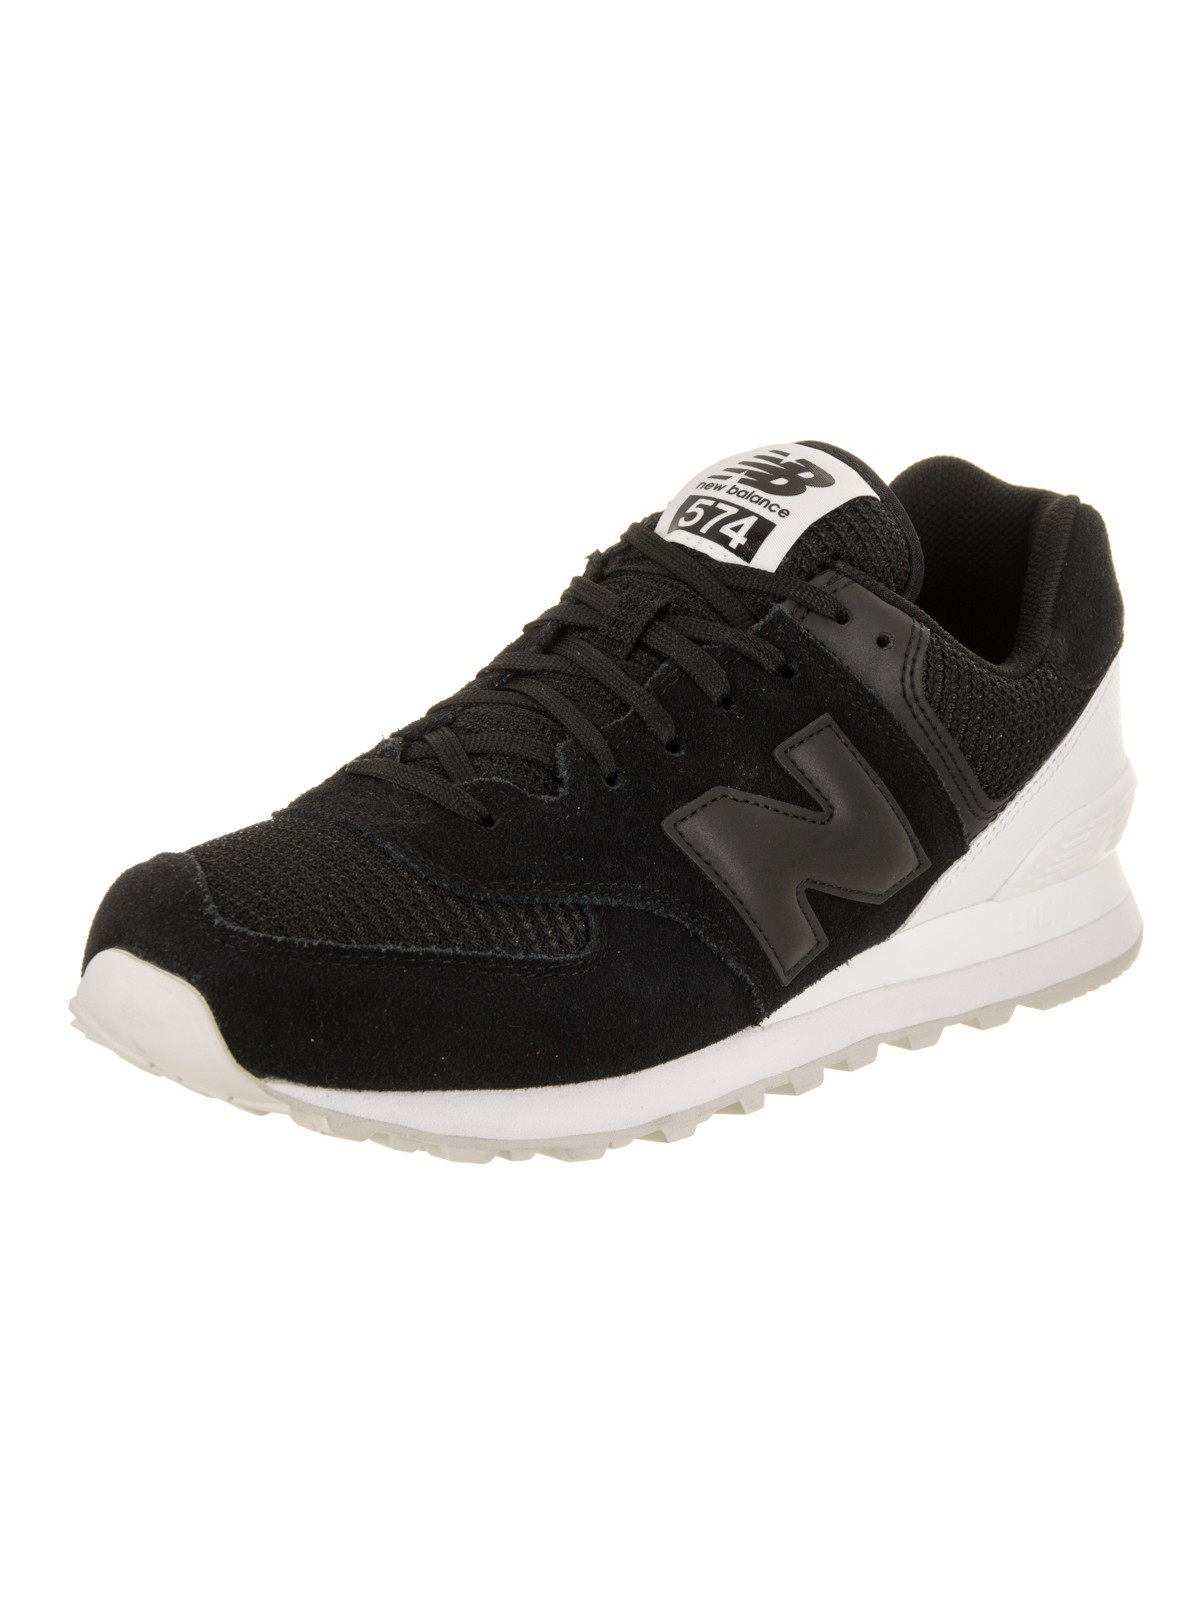 New Balance Men's 574 Classics Running Shoe by New Balance